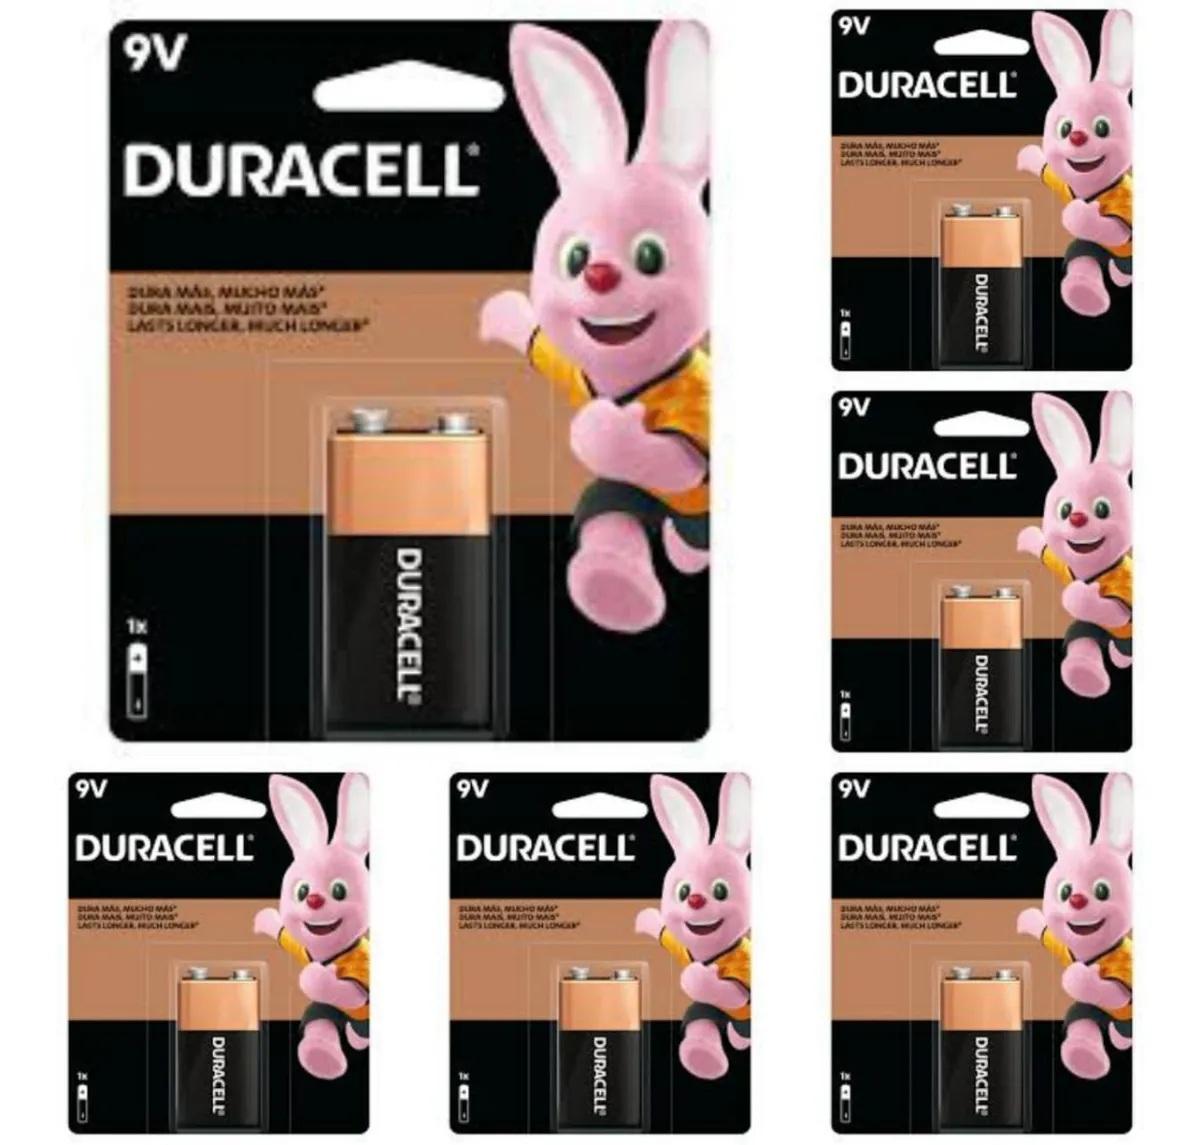 6 Bateria Duracell Pilha Alcalina 9V Mn1604b1